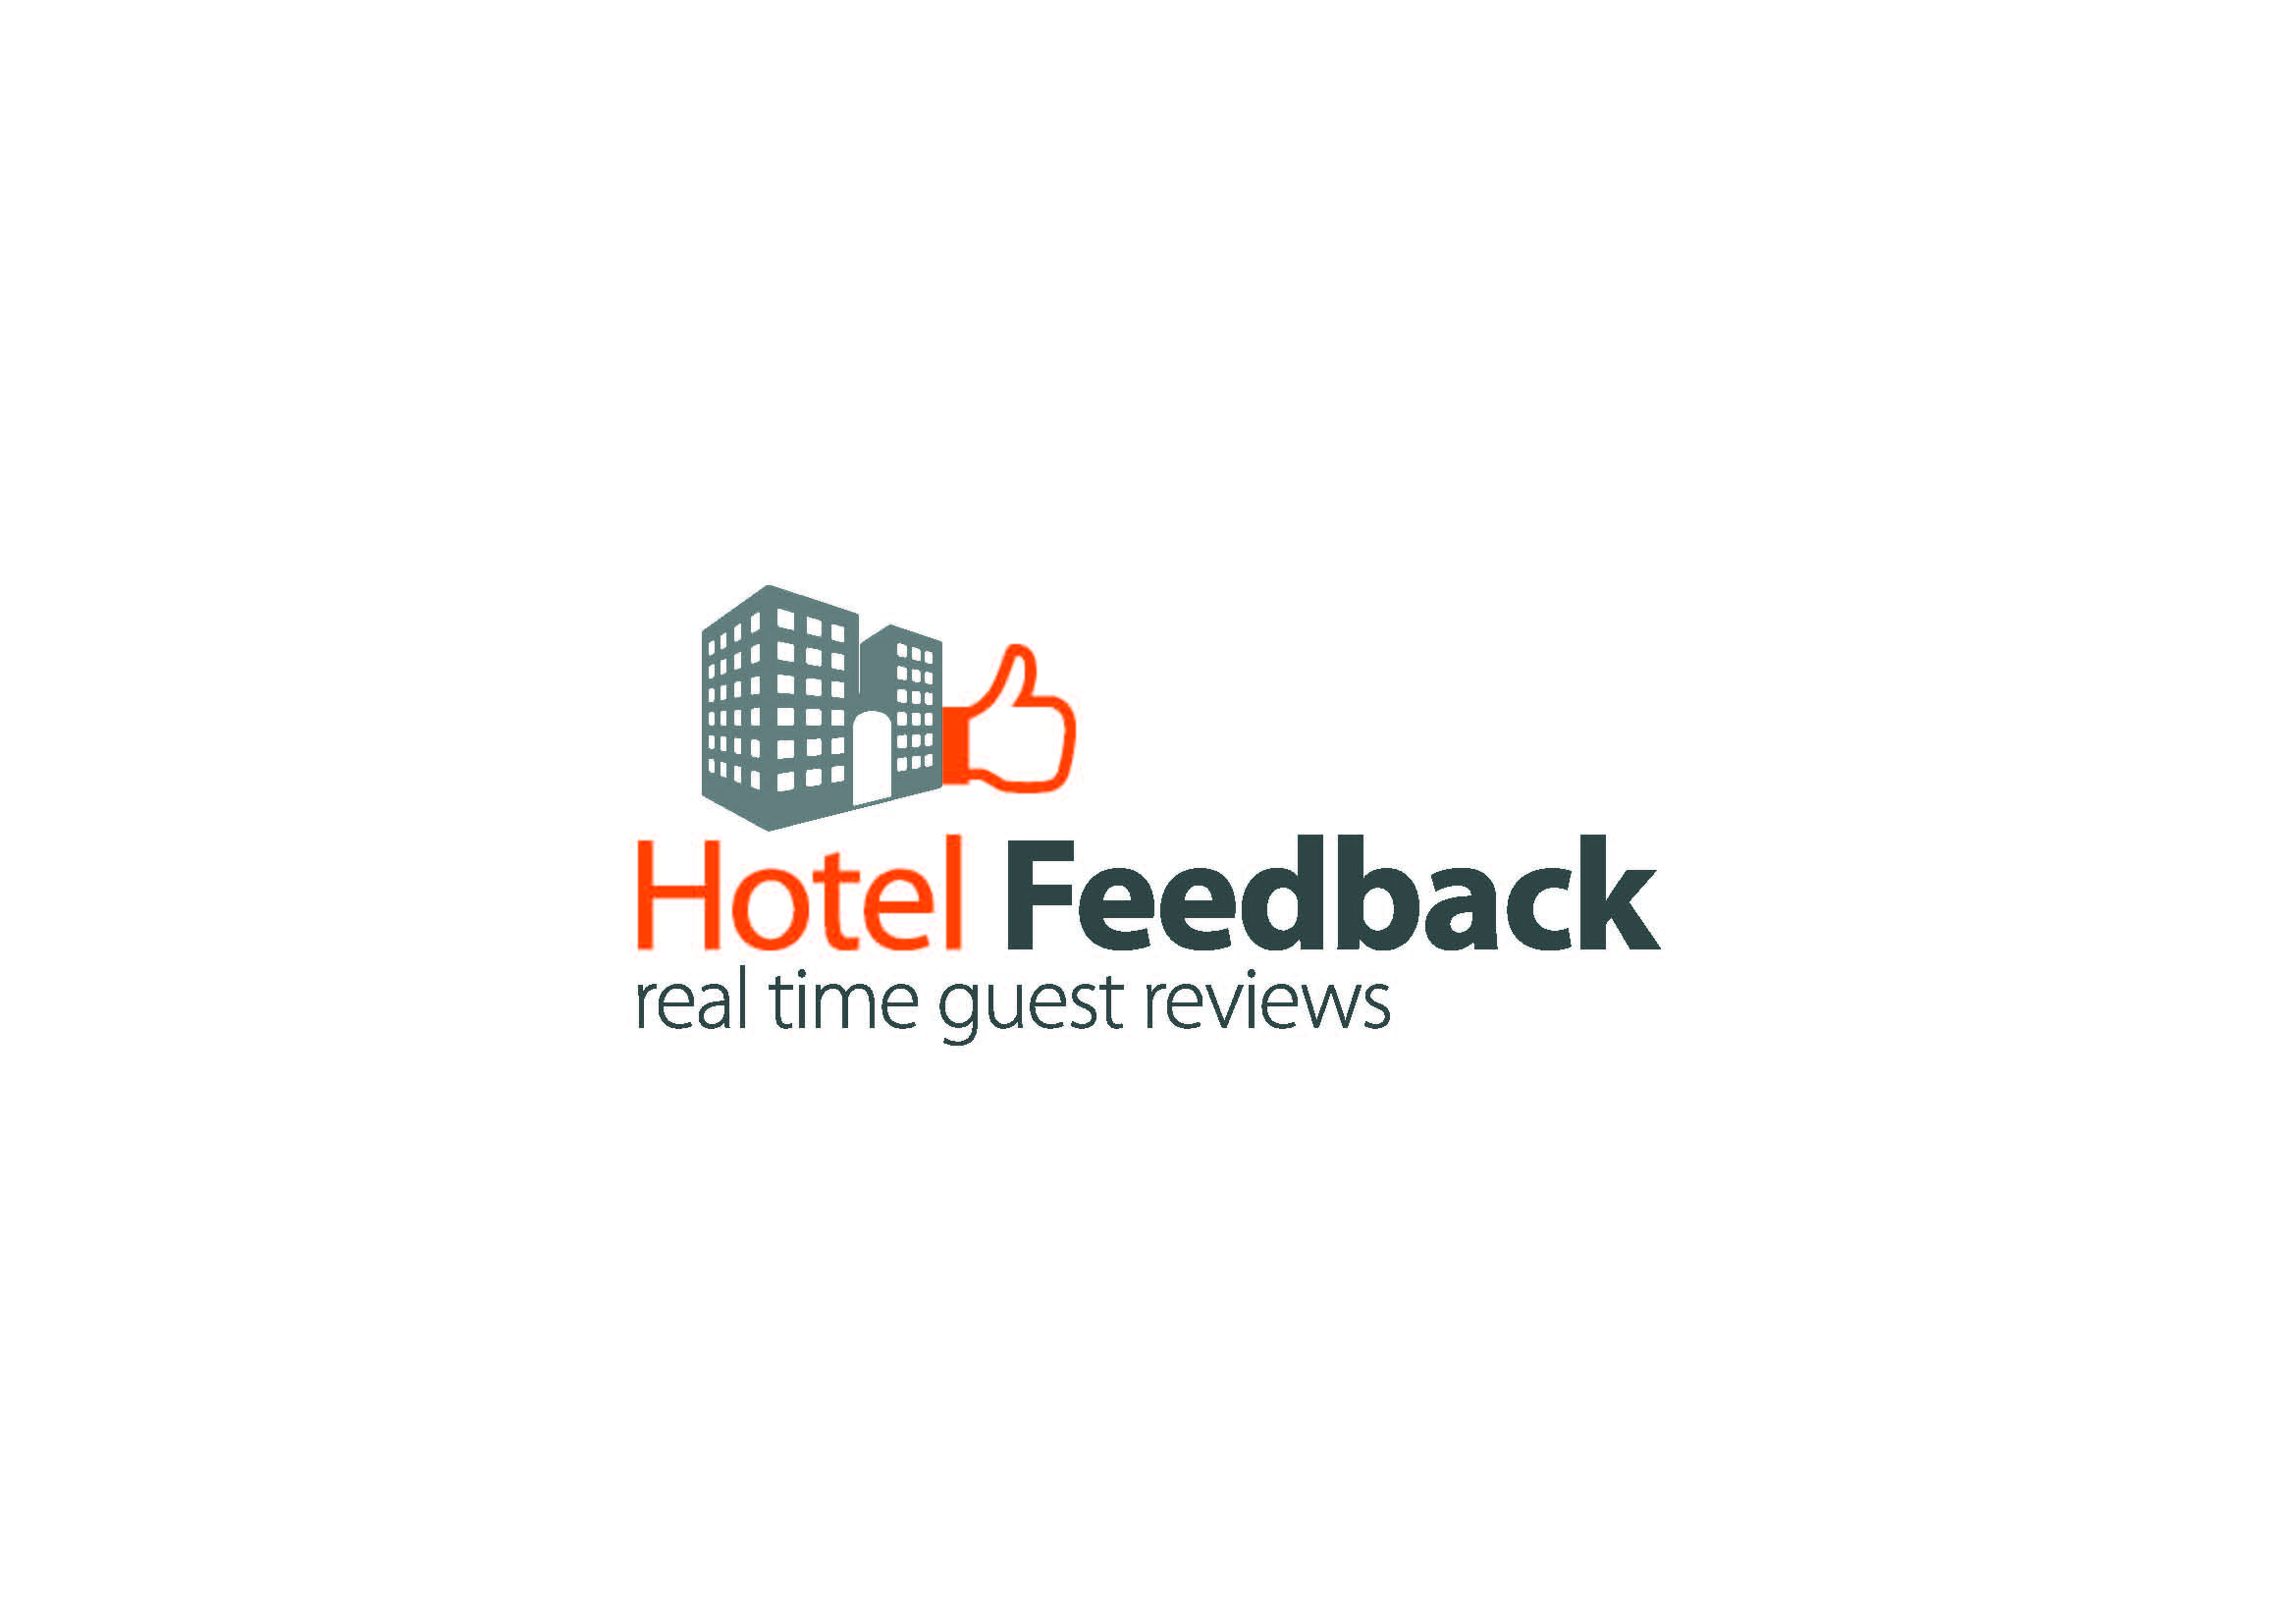 Hotel Feedback